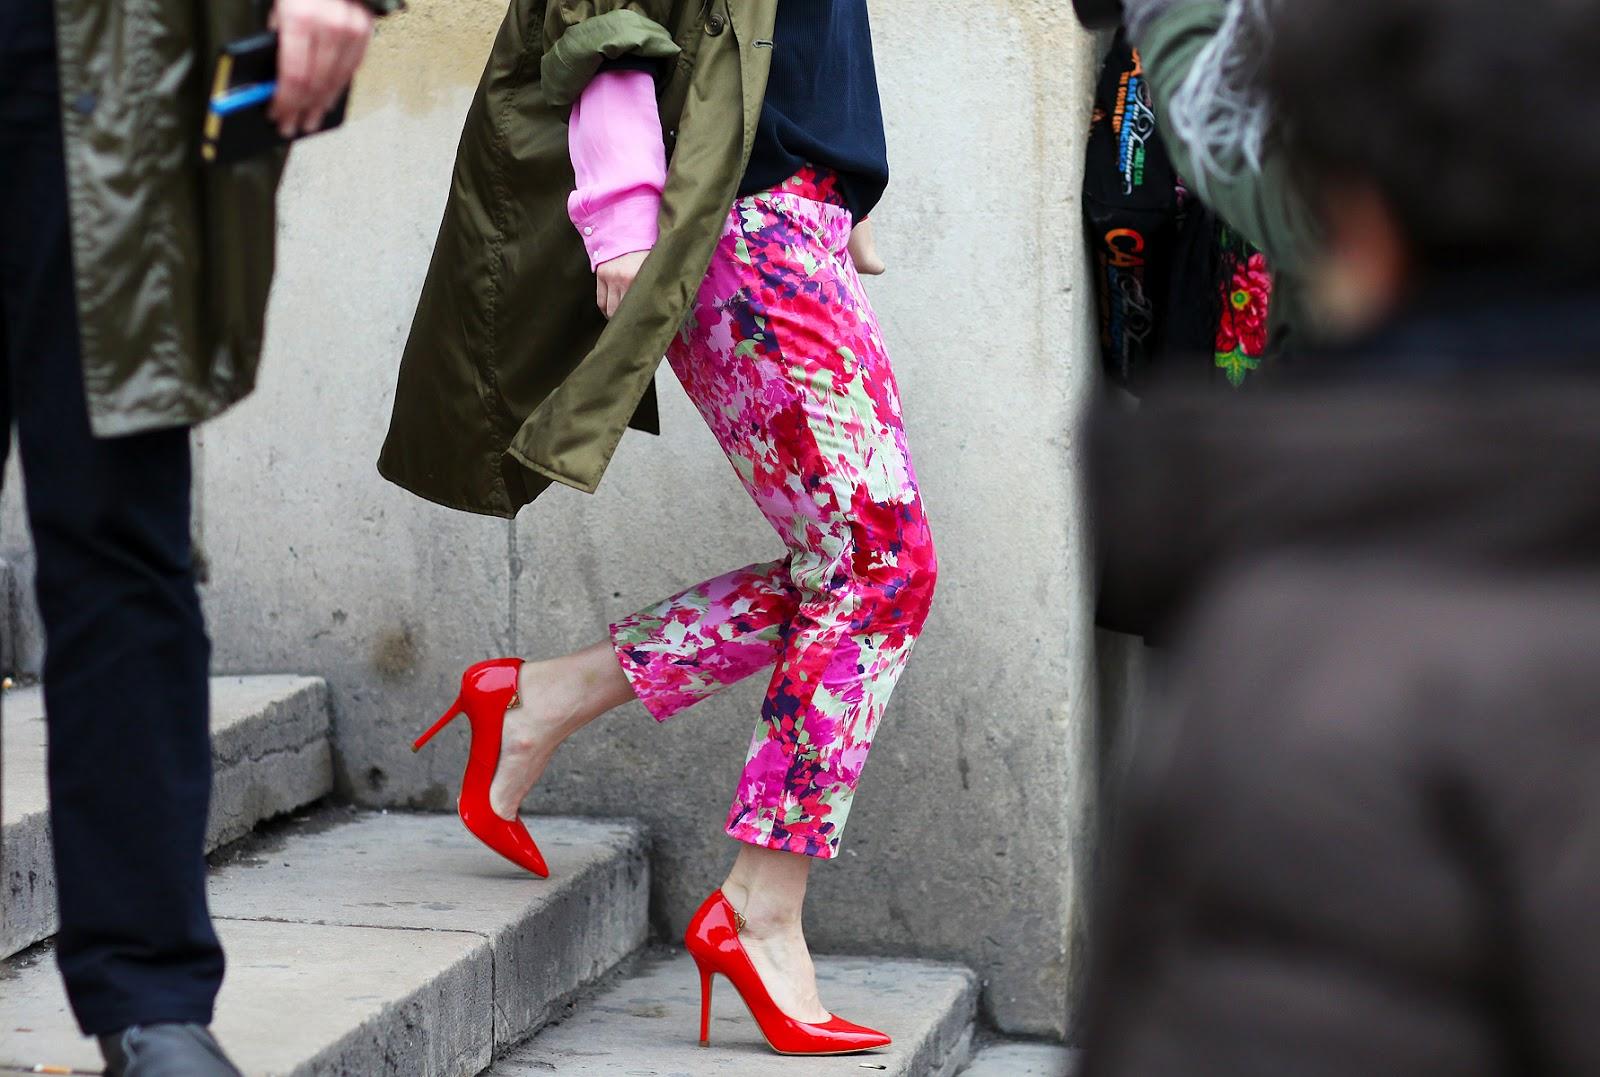 http://3.bp.blogspot.com/-dnZSSDz51Jg/T2FLBimyW5I/AAAAAAAAL2k/6EooCE9gDgo/s1600/la+modella+mafia+paris+street+Zara+pumps.jpg